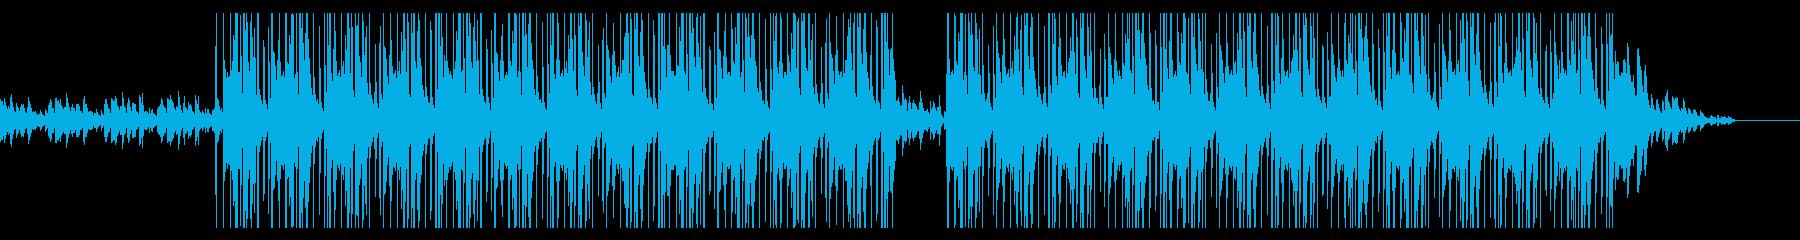 Lofi・チルアウト・ヒップホップの再生済みの波形